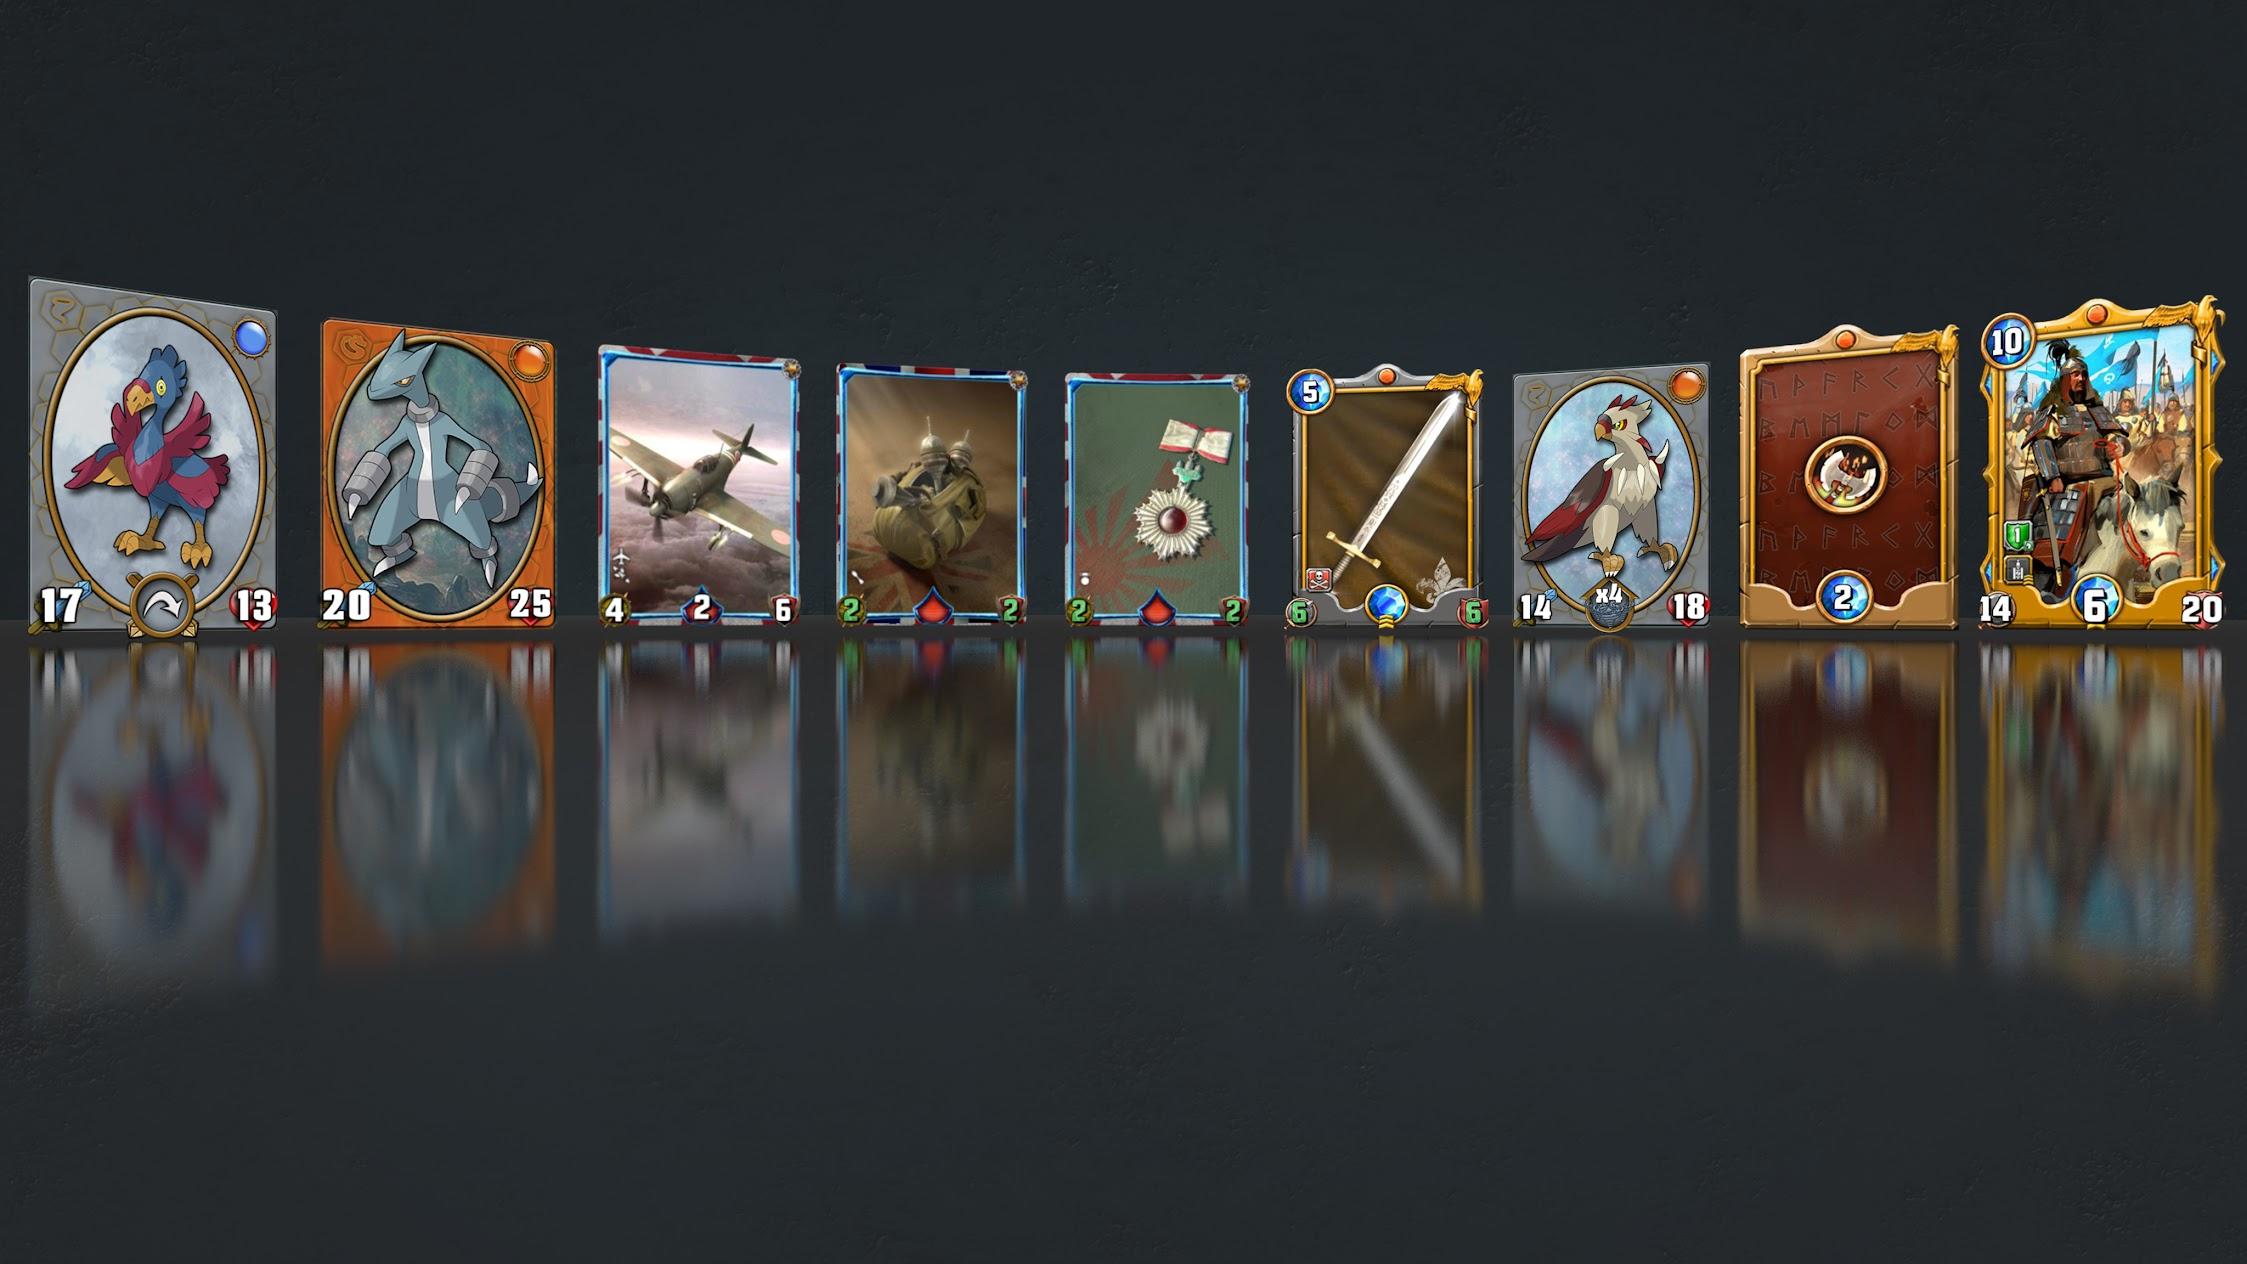 FrozenShard Games